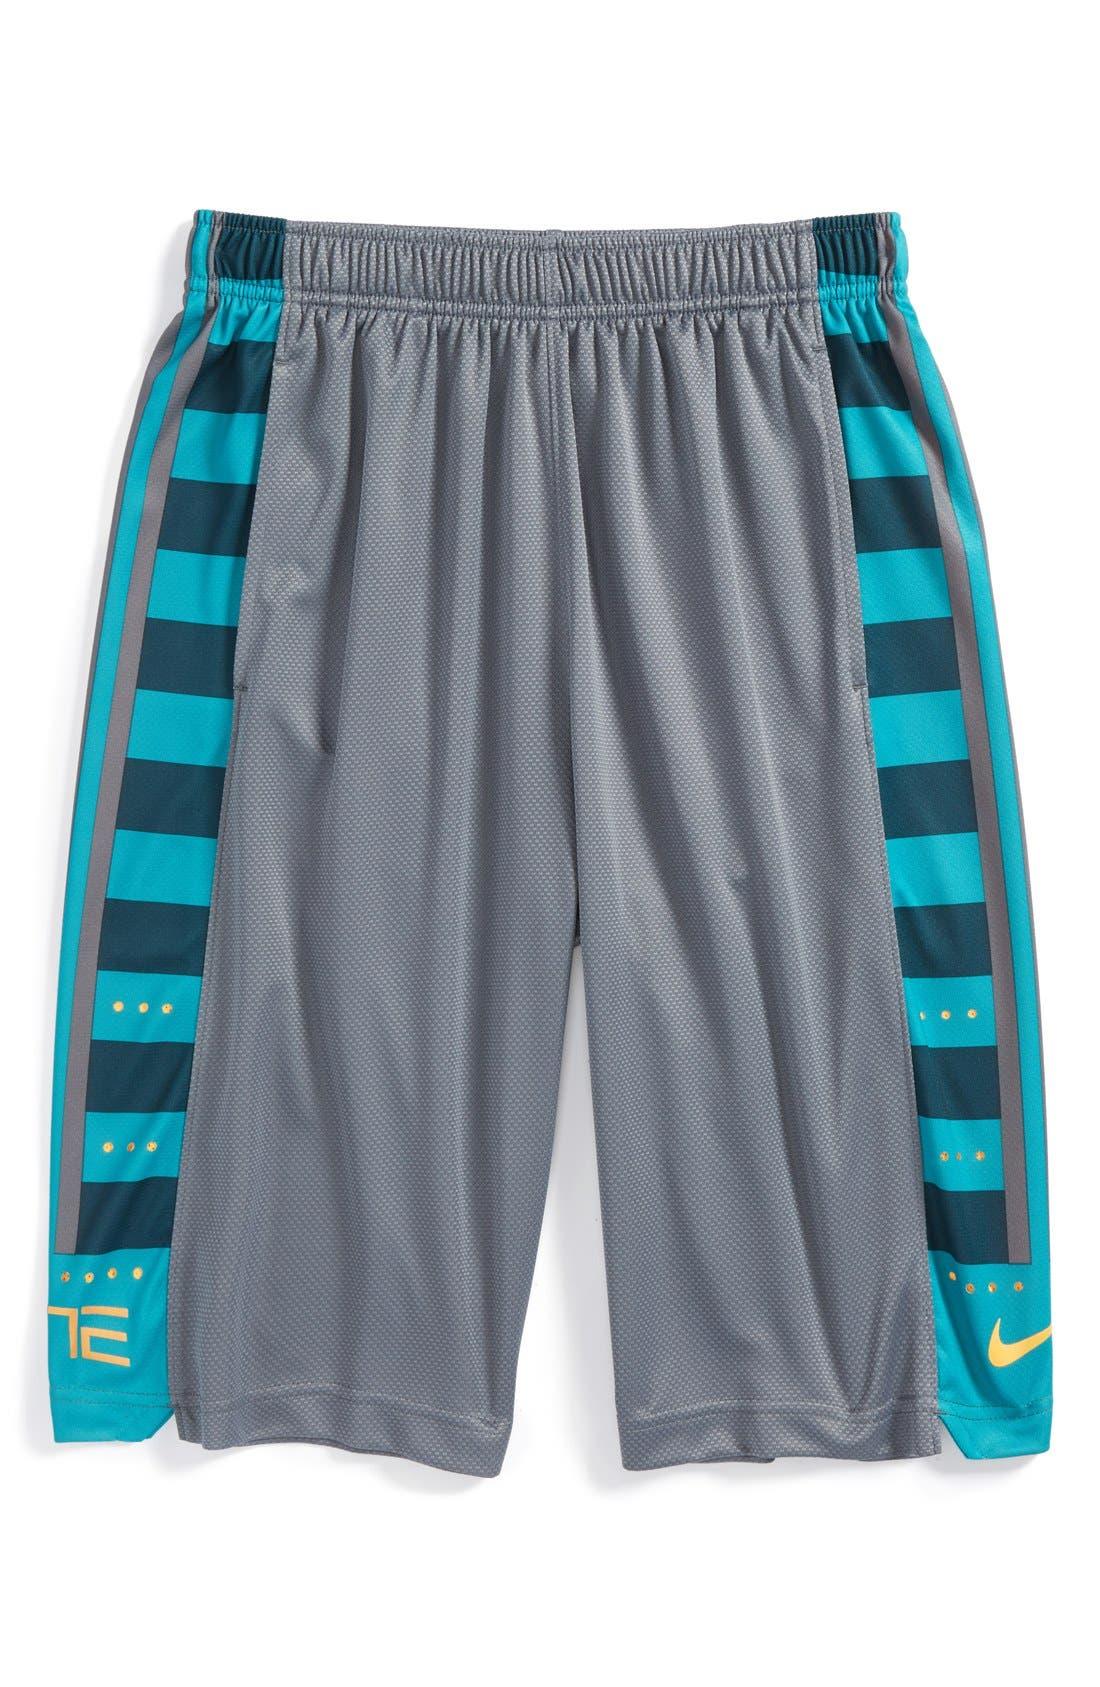 Alternate Image 1 Selected - Nike 'Fanatical' Dri-FIT Mesh Shorts (Big Boys)